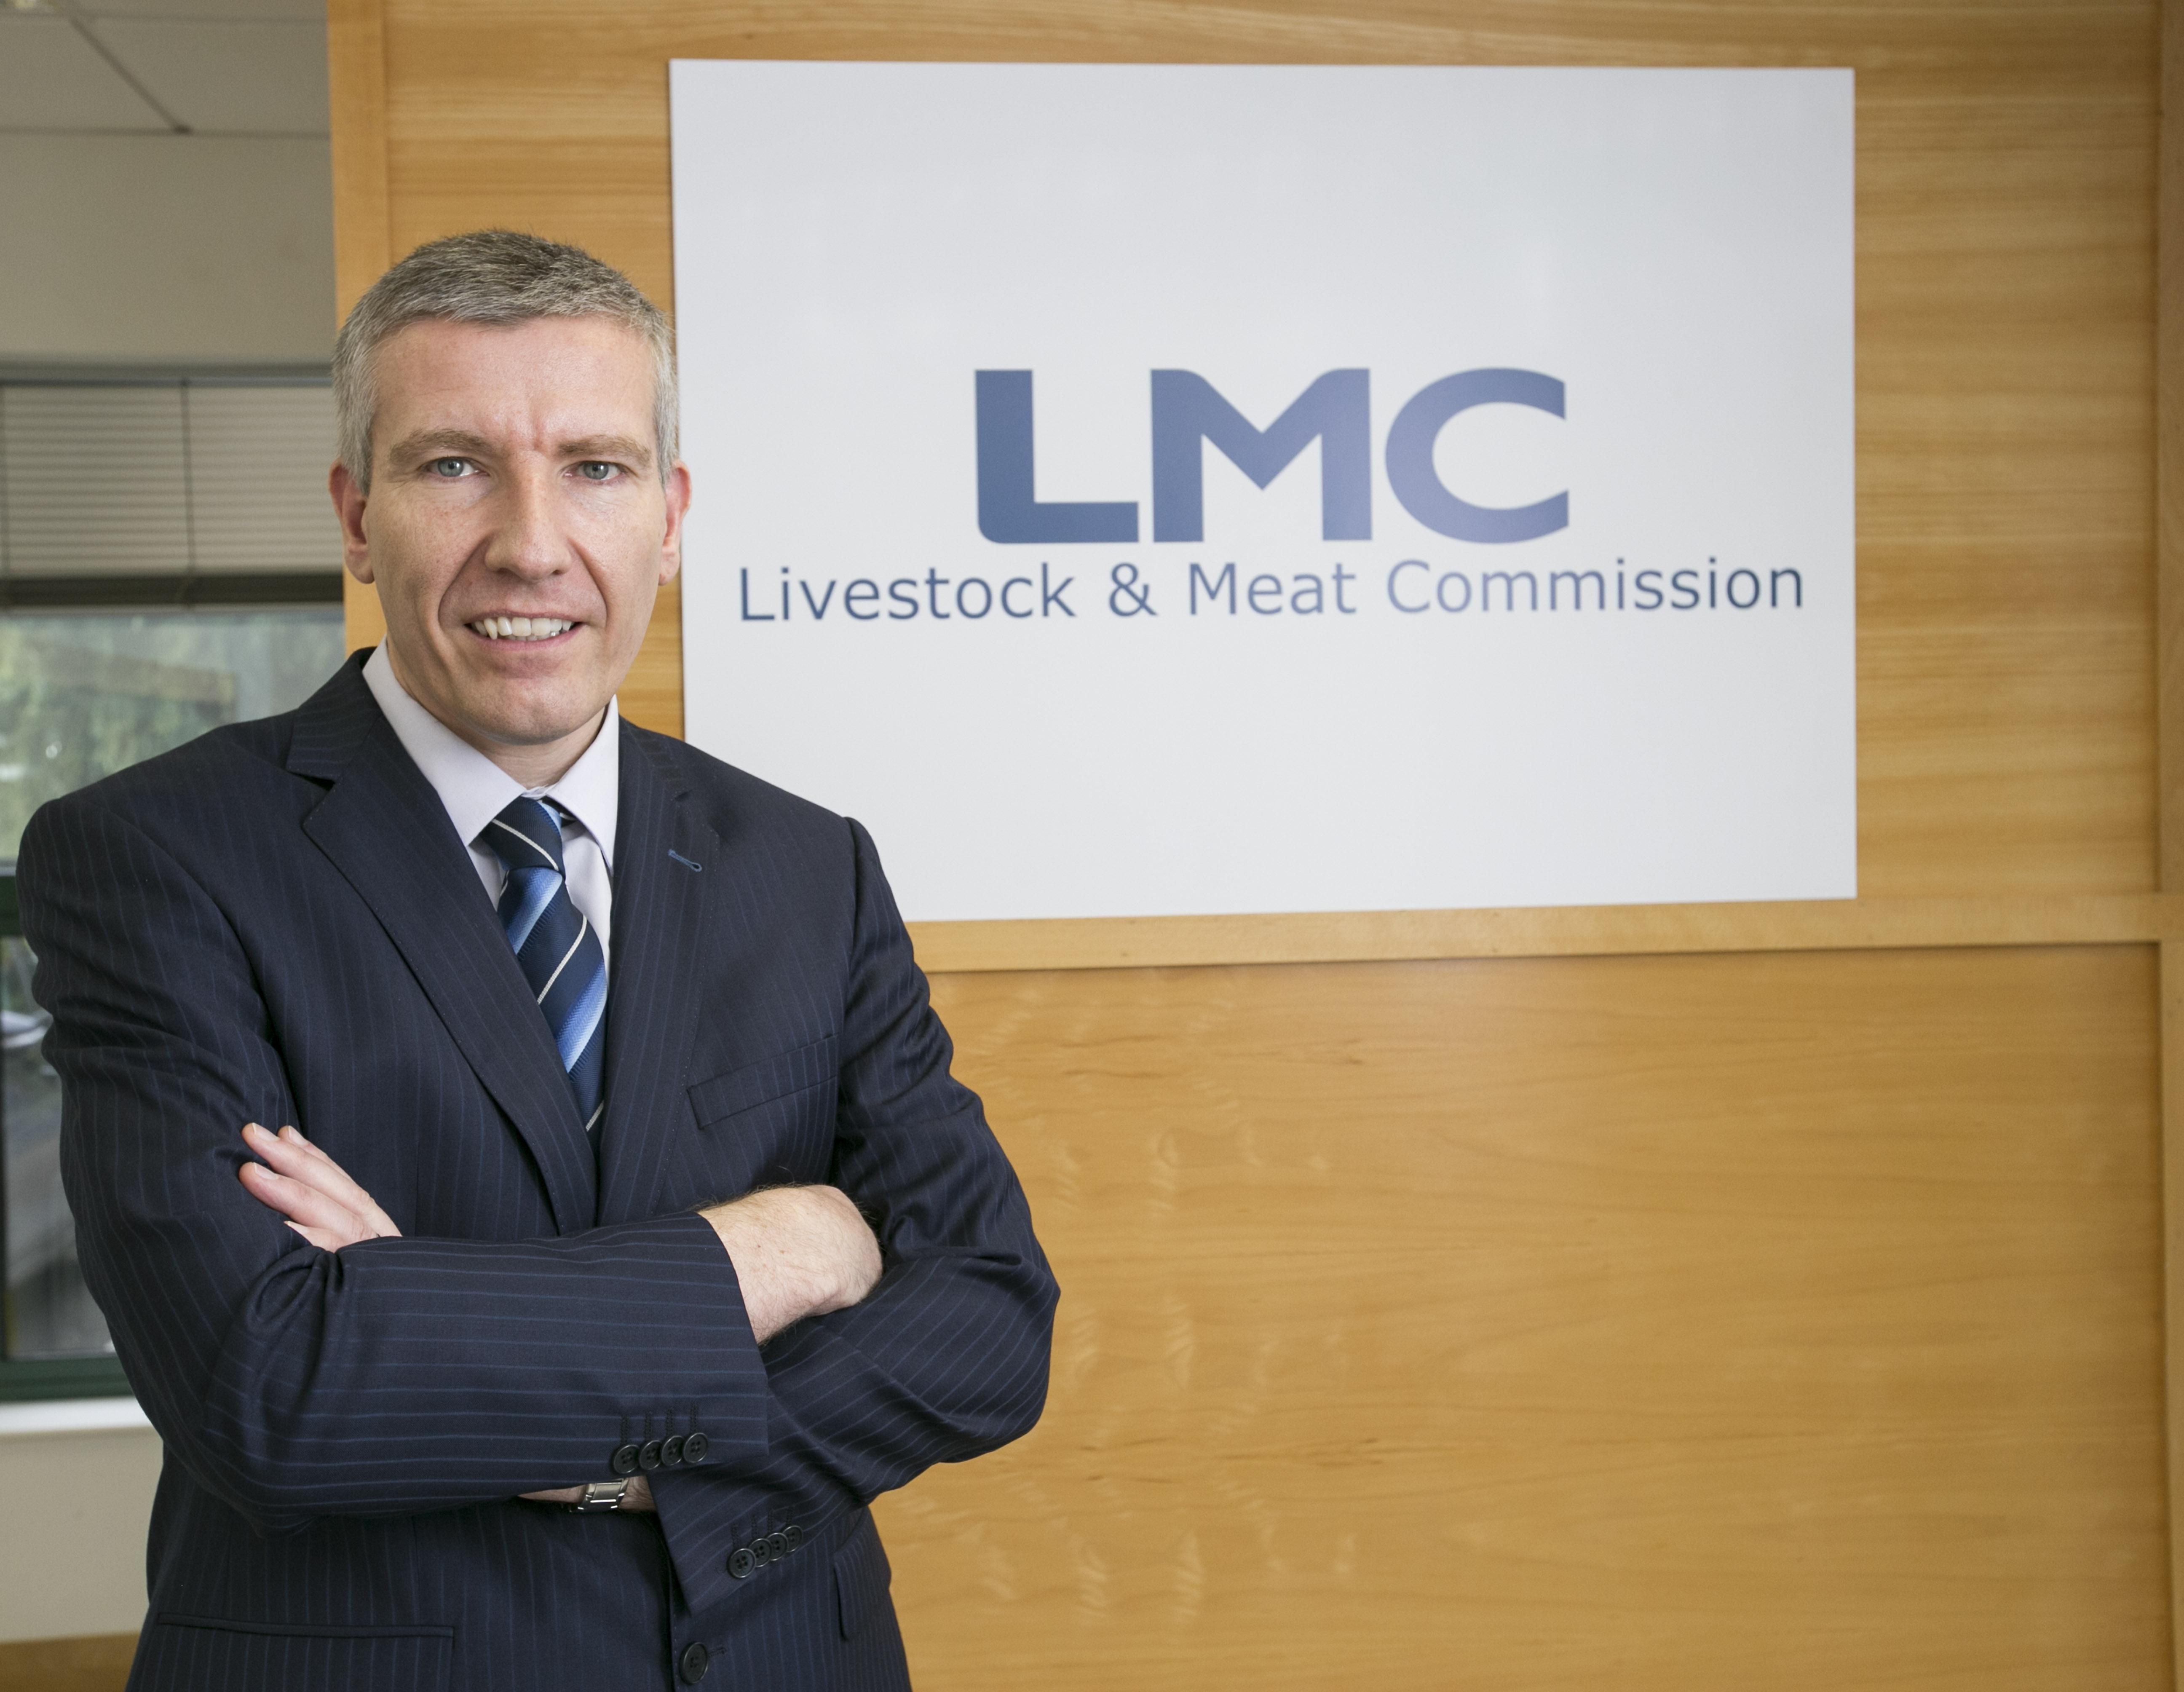 Ian Stevenson, chief executive, Livestock & Meat Commission